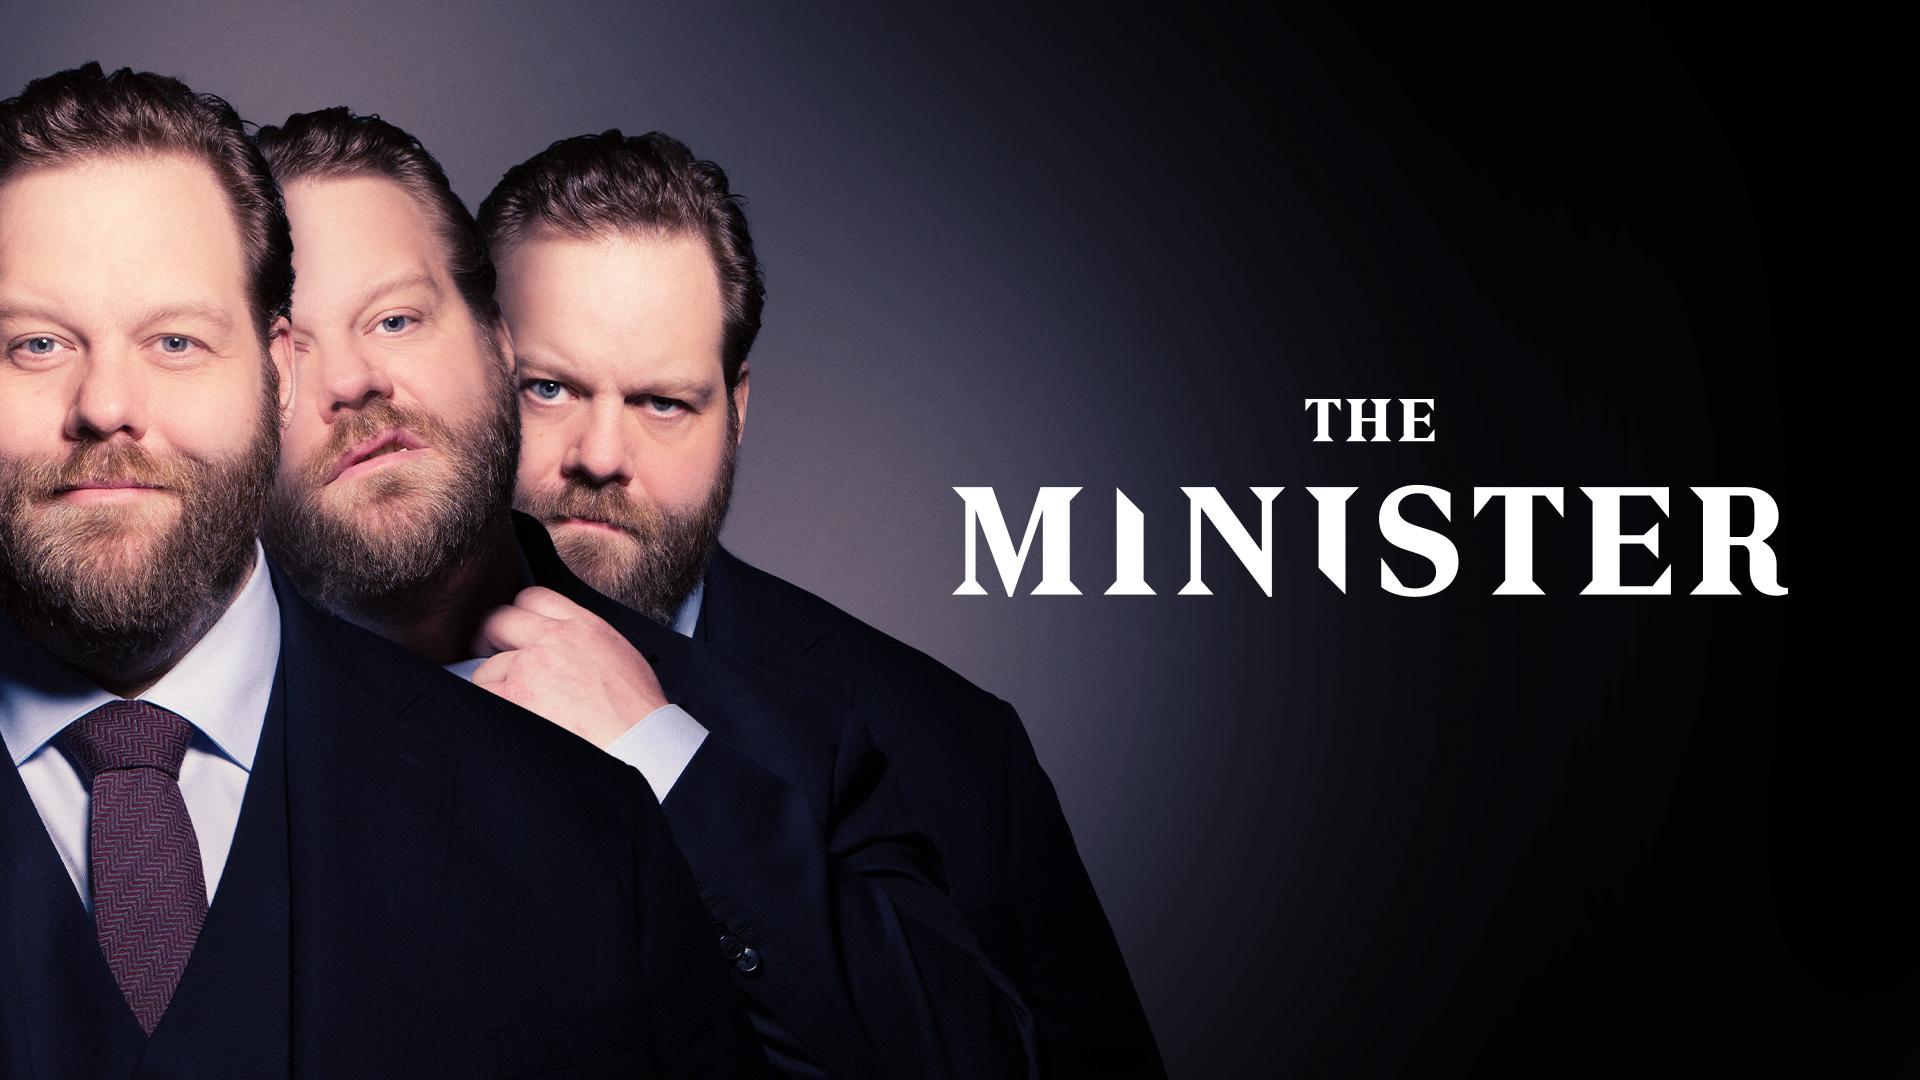 The Minister Season 1